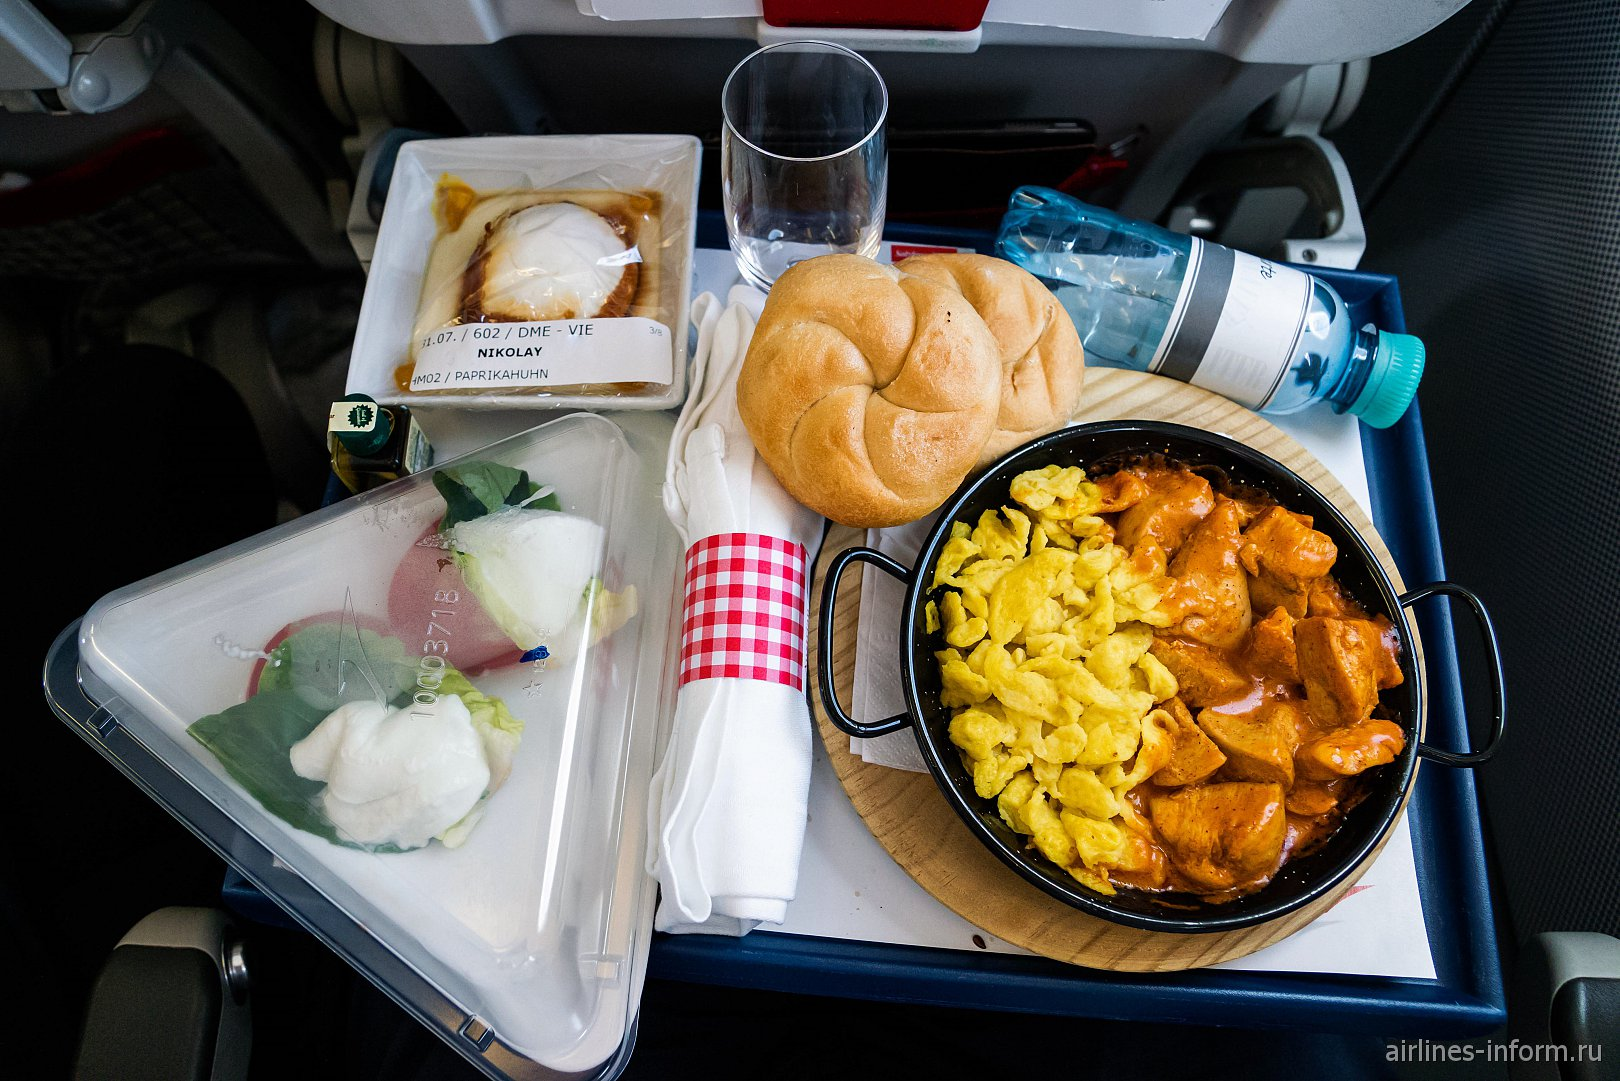 Бортовое питание из меню меню DO&CO a la carte на рейсе Москва-Вена Австрийских авиалиний